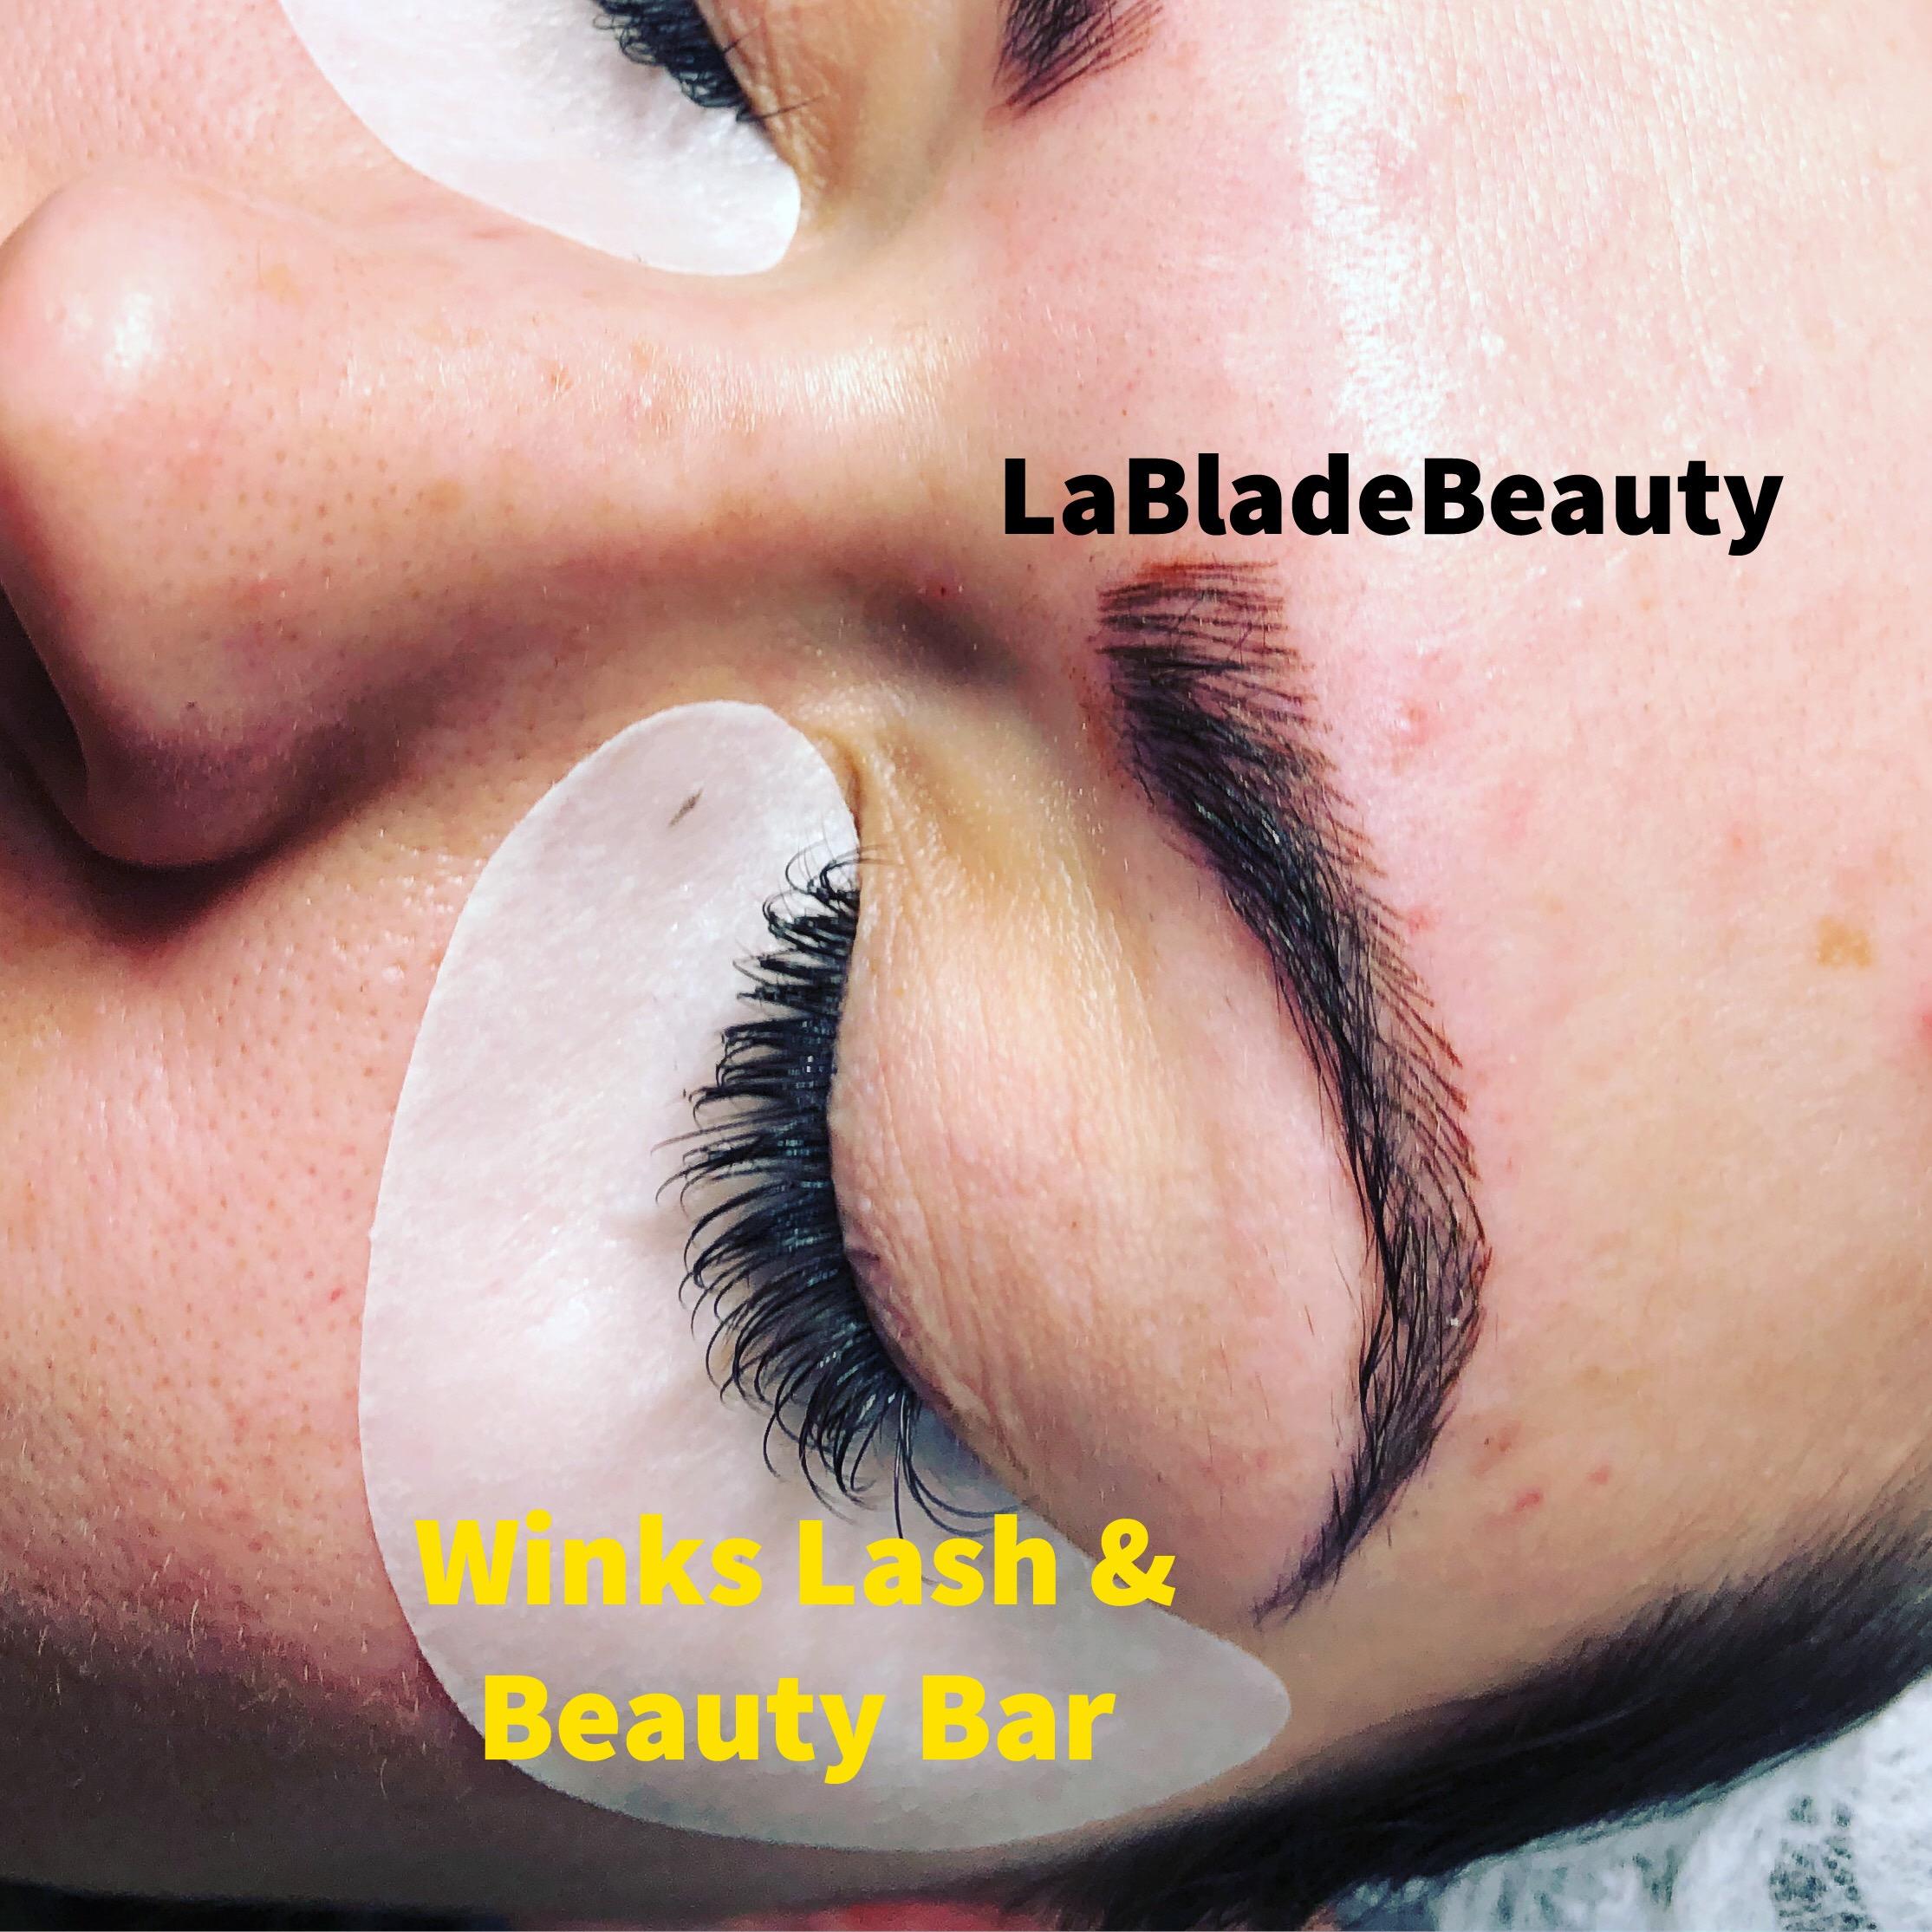 LaBlade Beauty